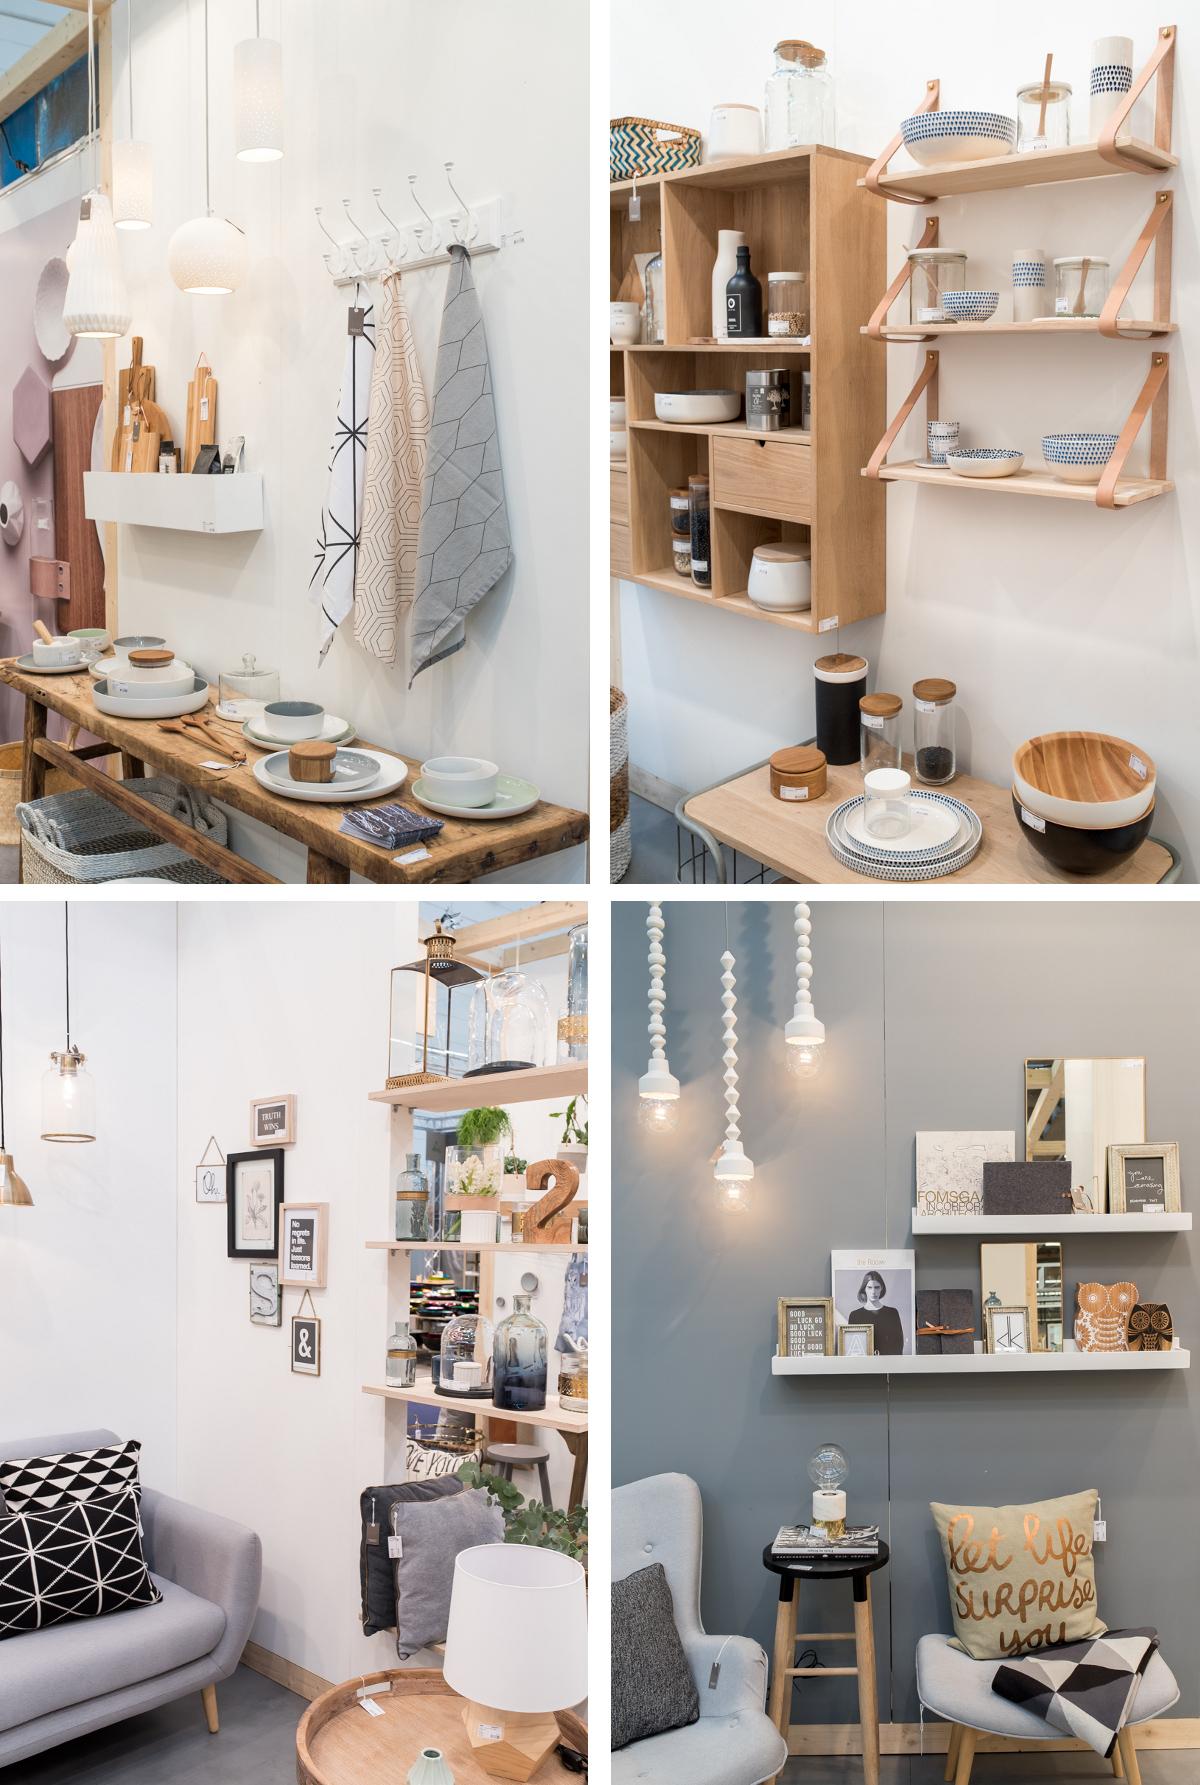 deko archives leelah lovesleelah loves. Black Bedroom Furniture Sets. Home Design Ideas